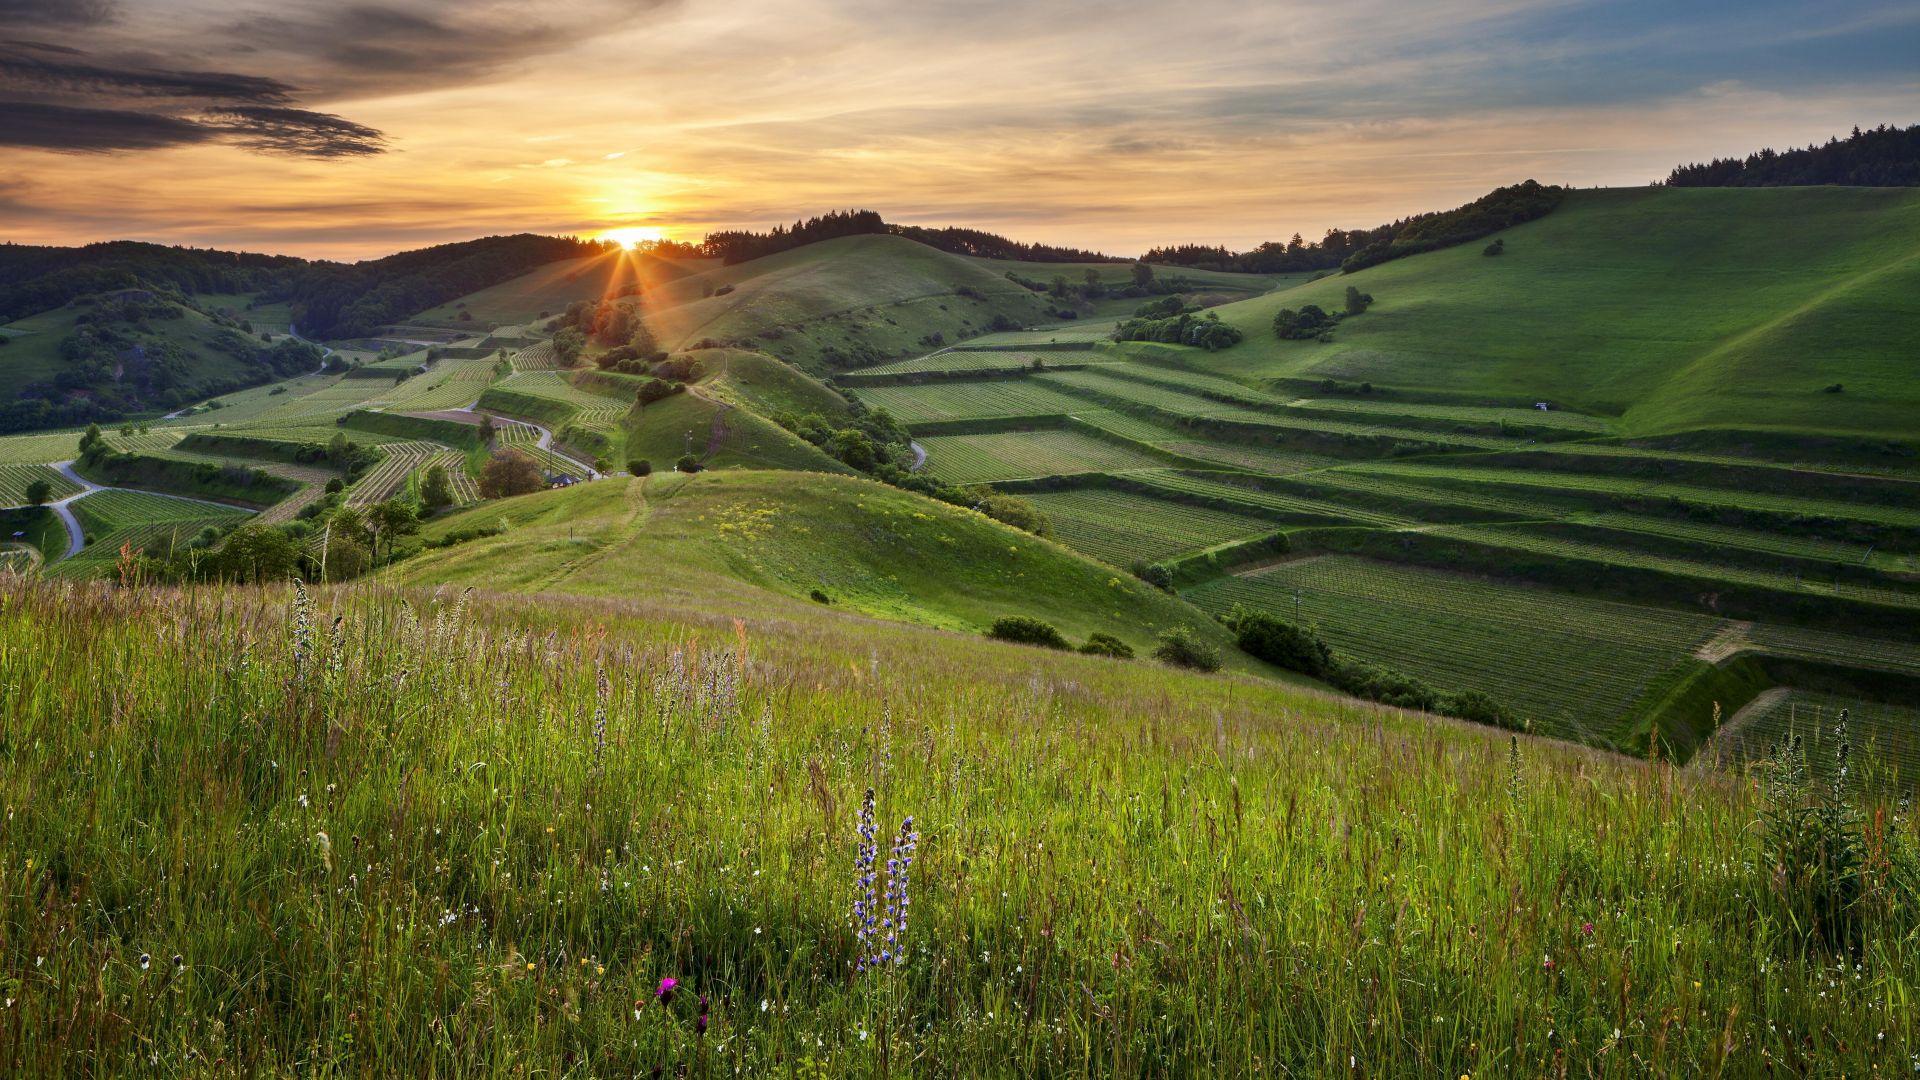 Vogtsburg im Kaiserstuhl: sunrise over hills